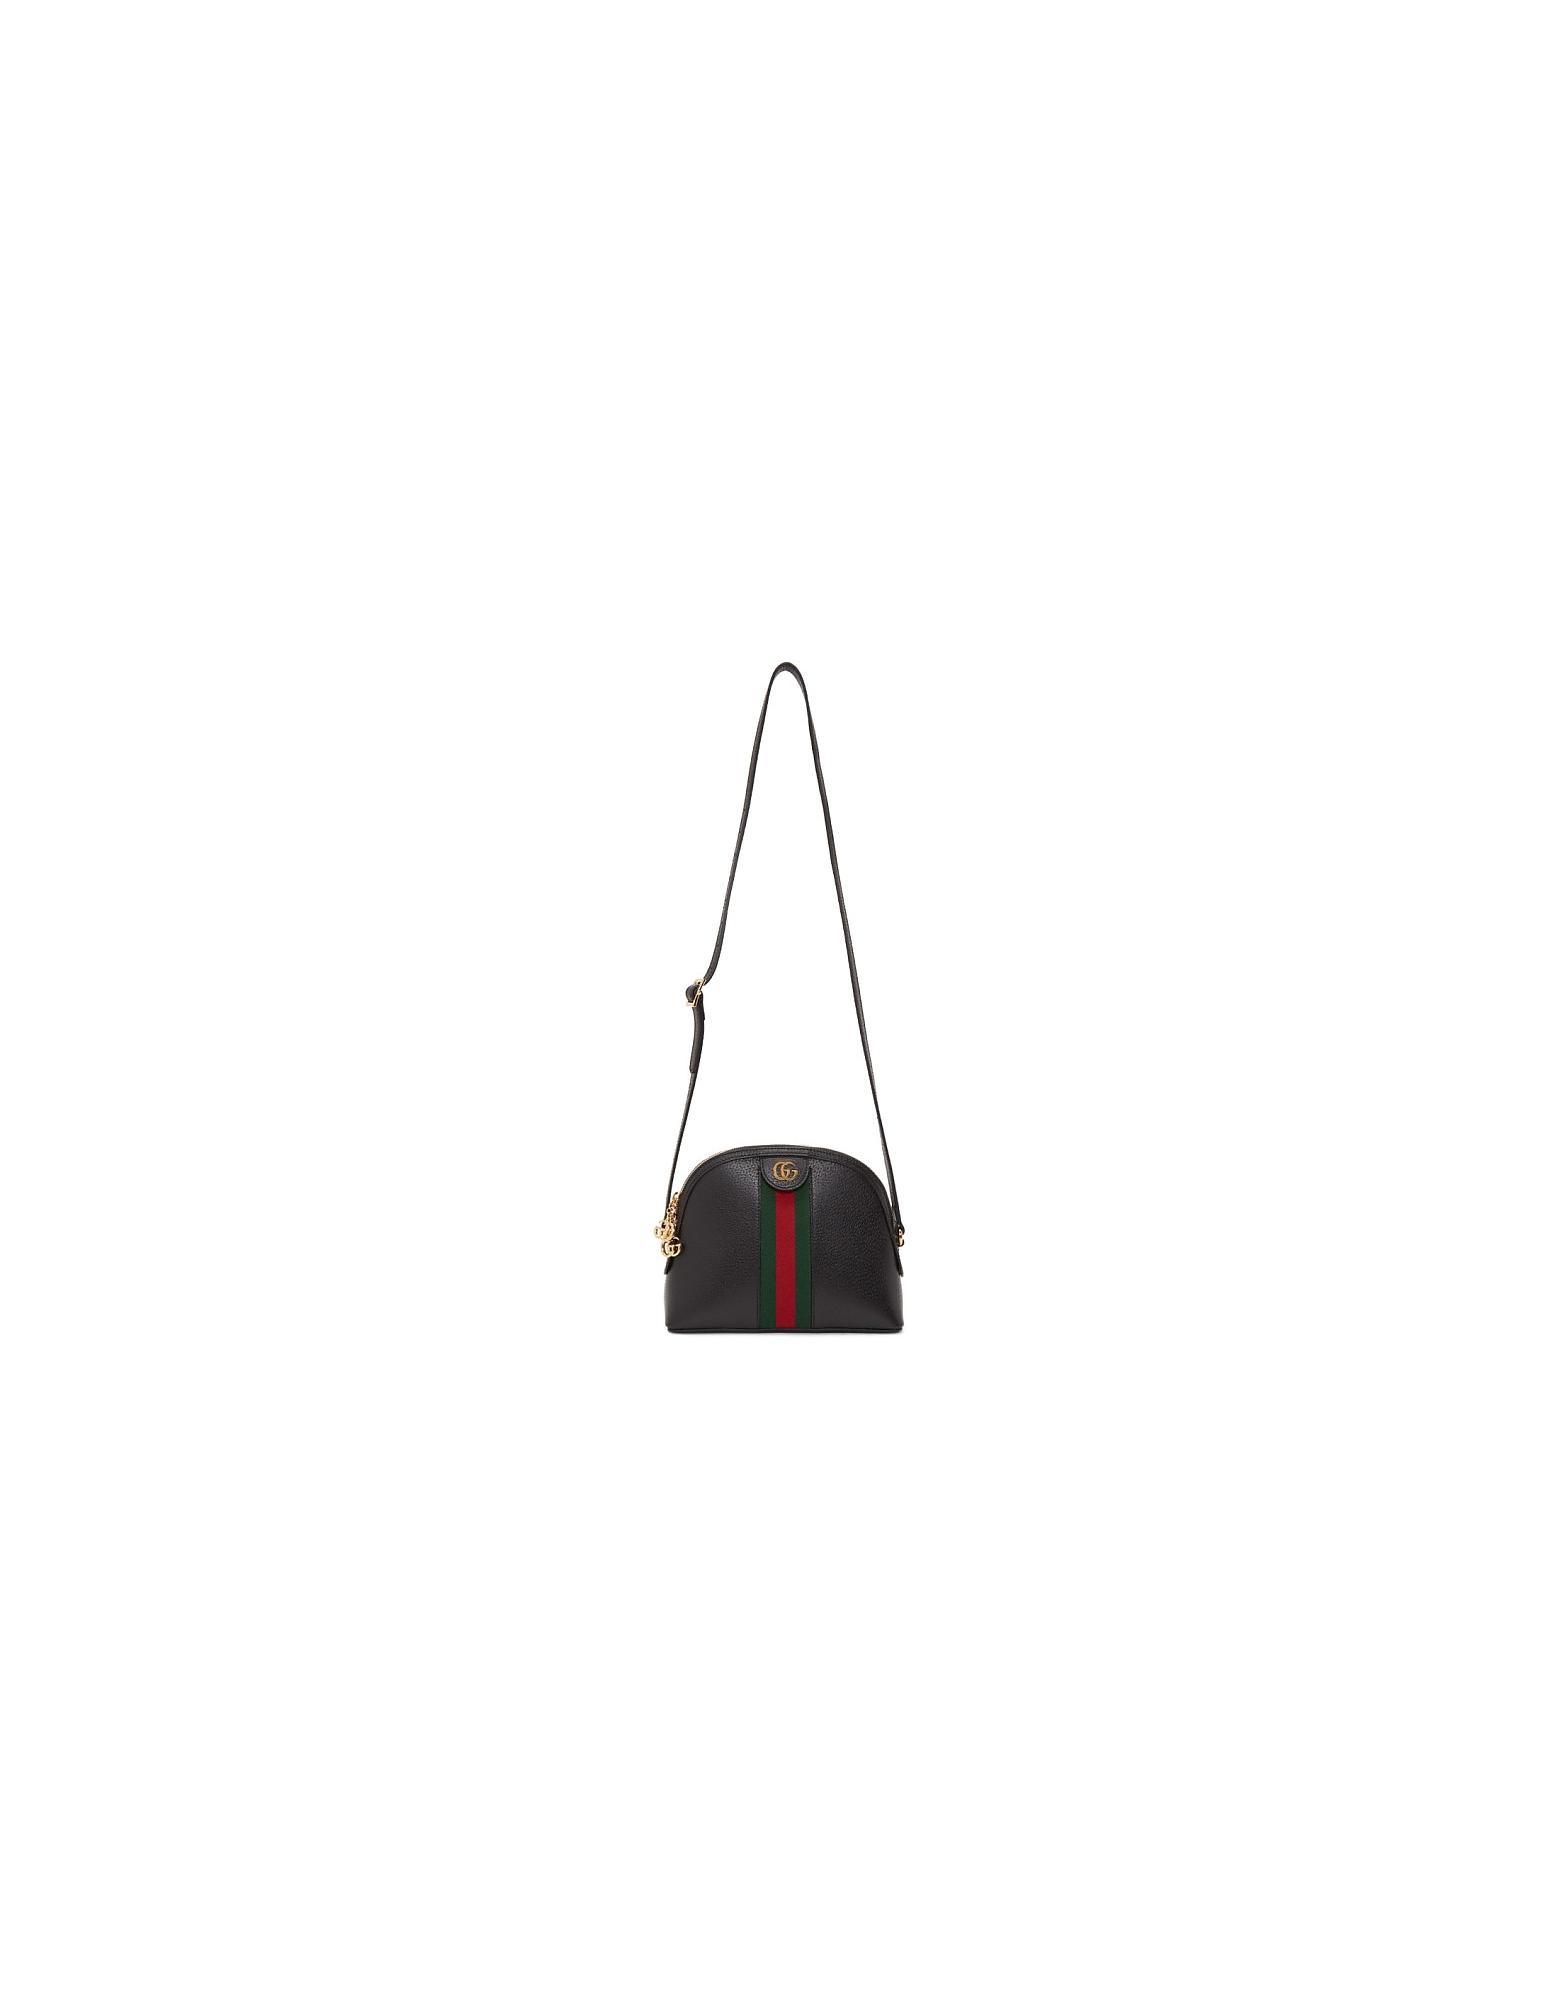 Gucci Designer Handbags, Black Small Ophidia Bag